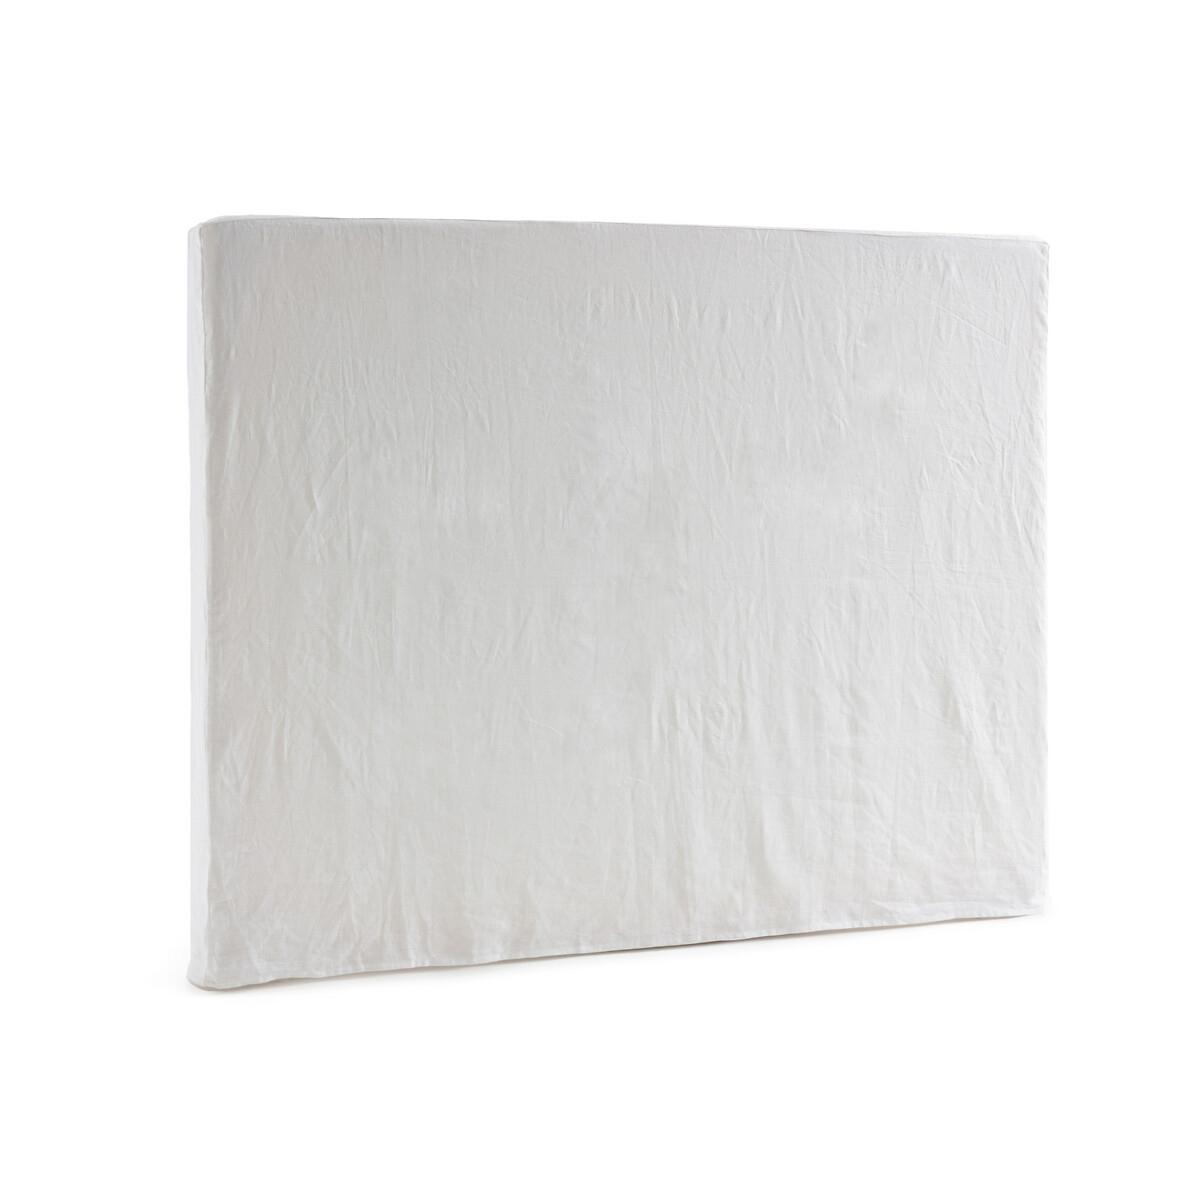 Чехол LaRedoute На кроватное изголовье 100 лен STADIA высота 120 см 120 x 10 x 160 см белый